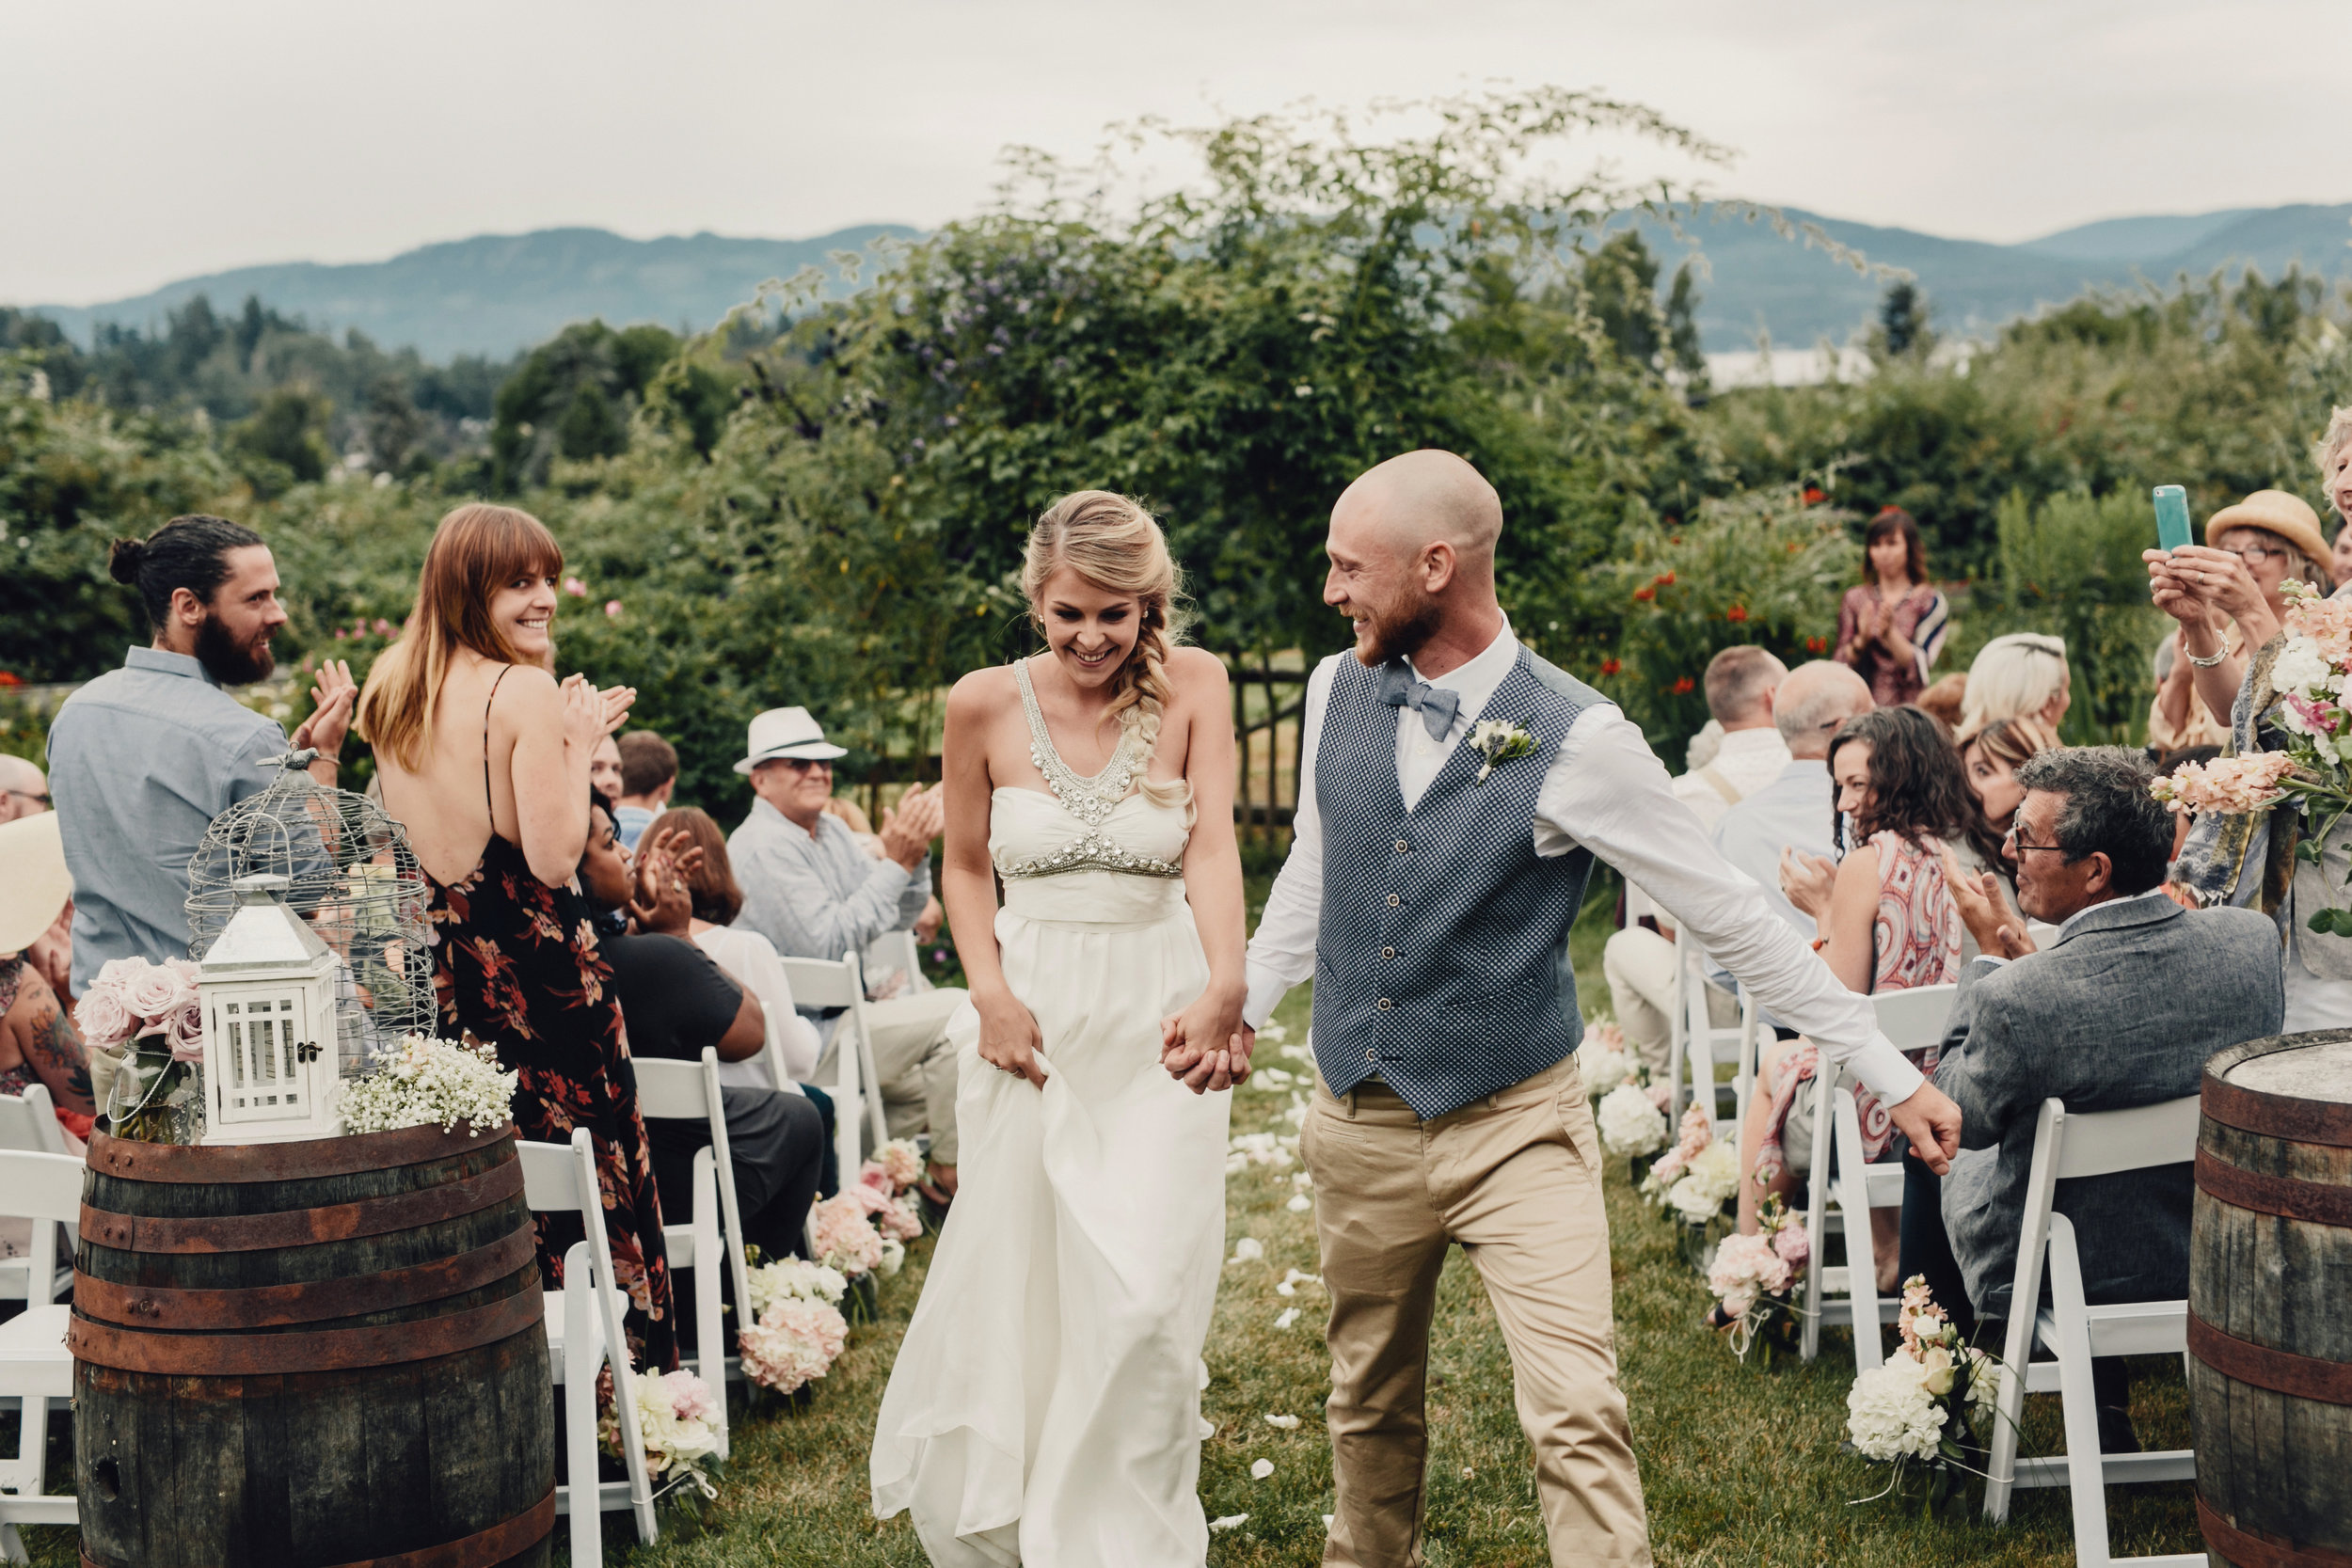 kildara-farms-wedding-photo-inspiration-0050